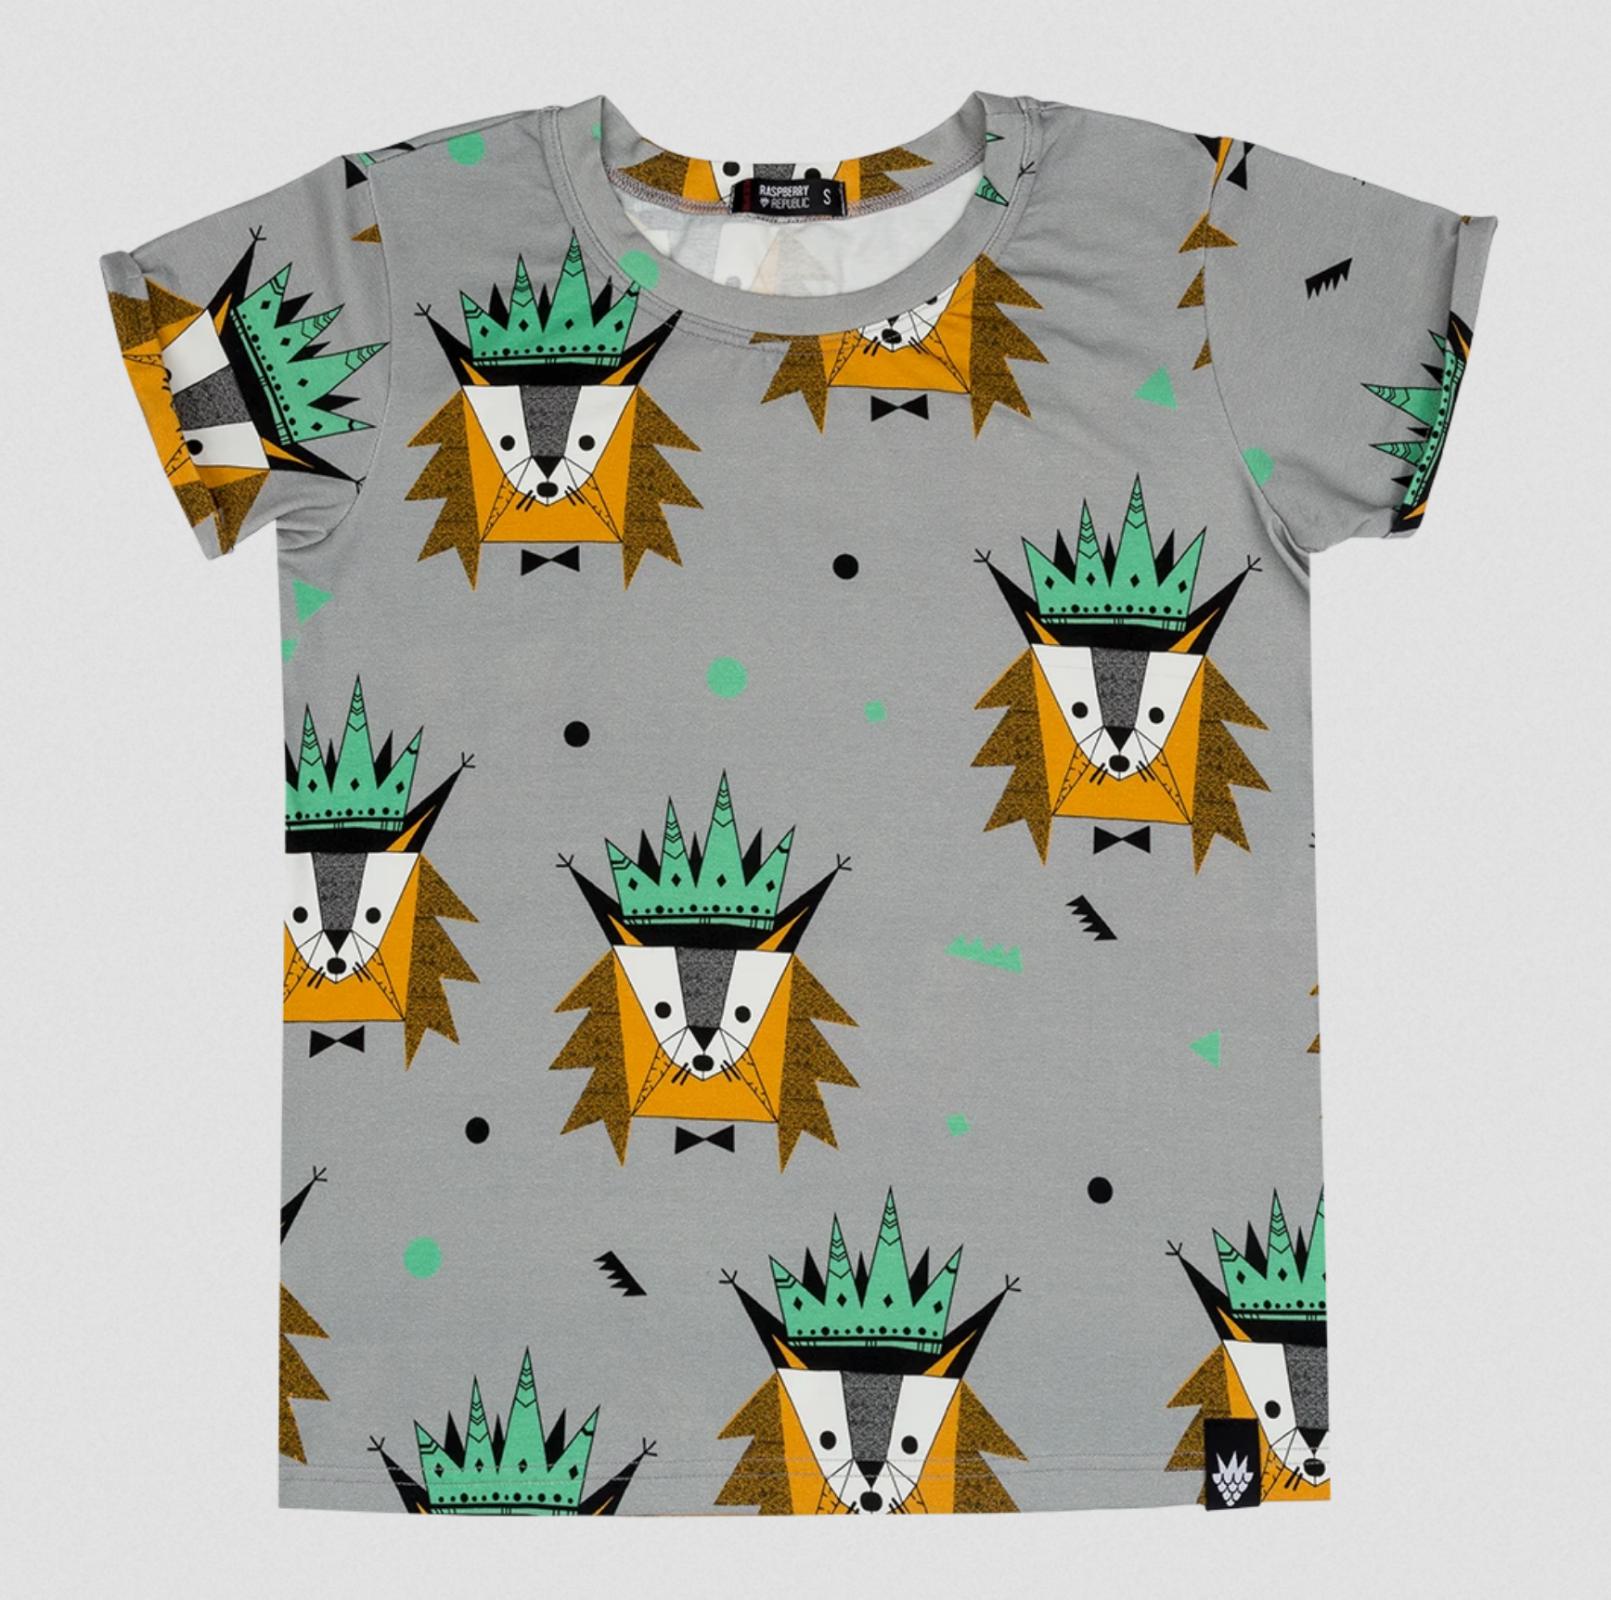 Mr. Bobcat T-Shirt by Raspberry Republic